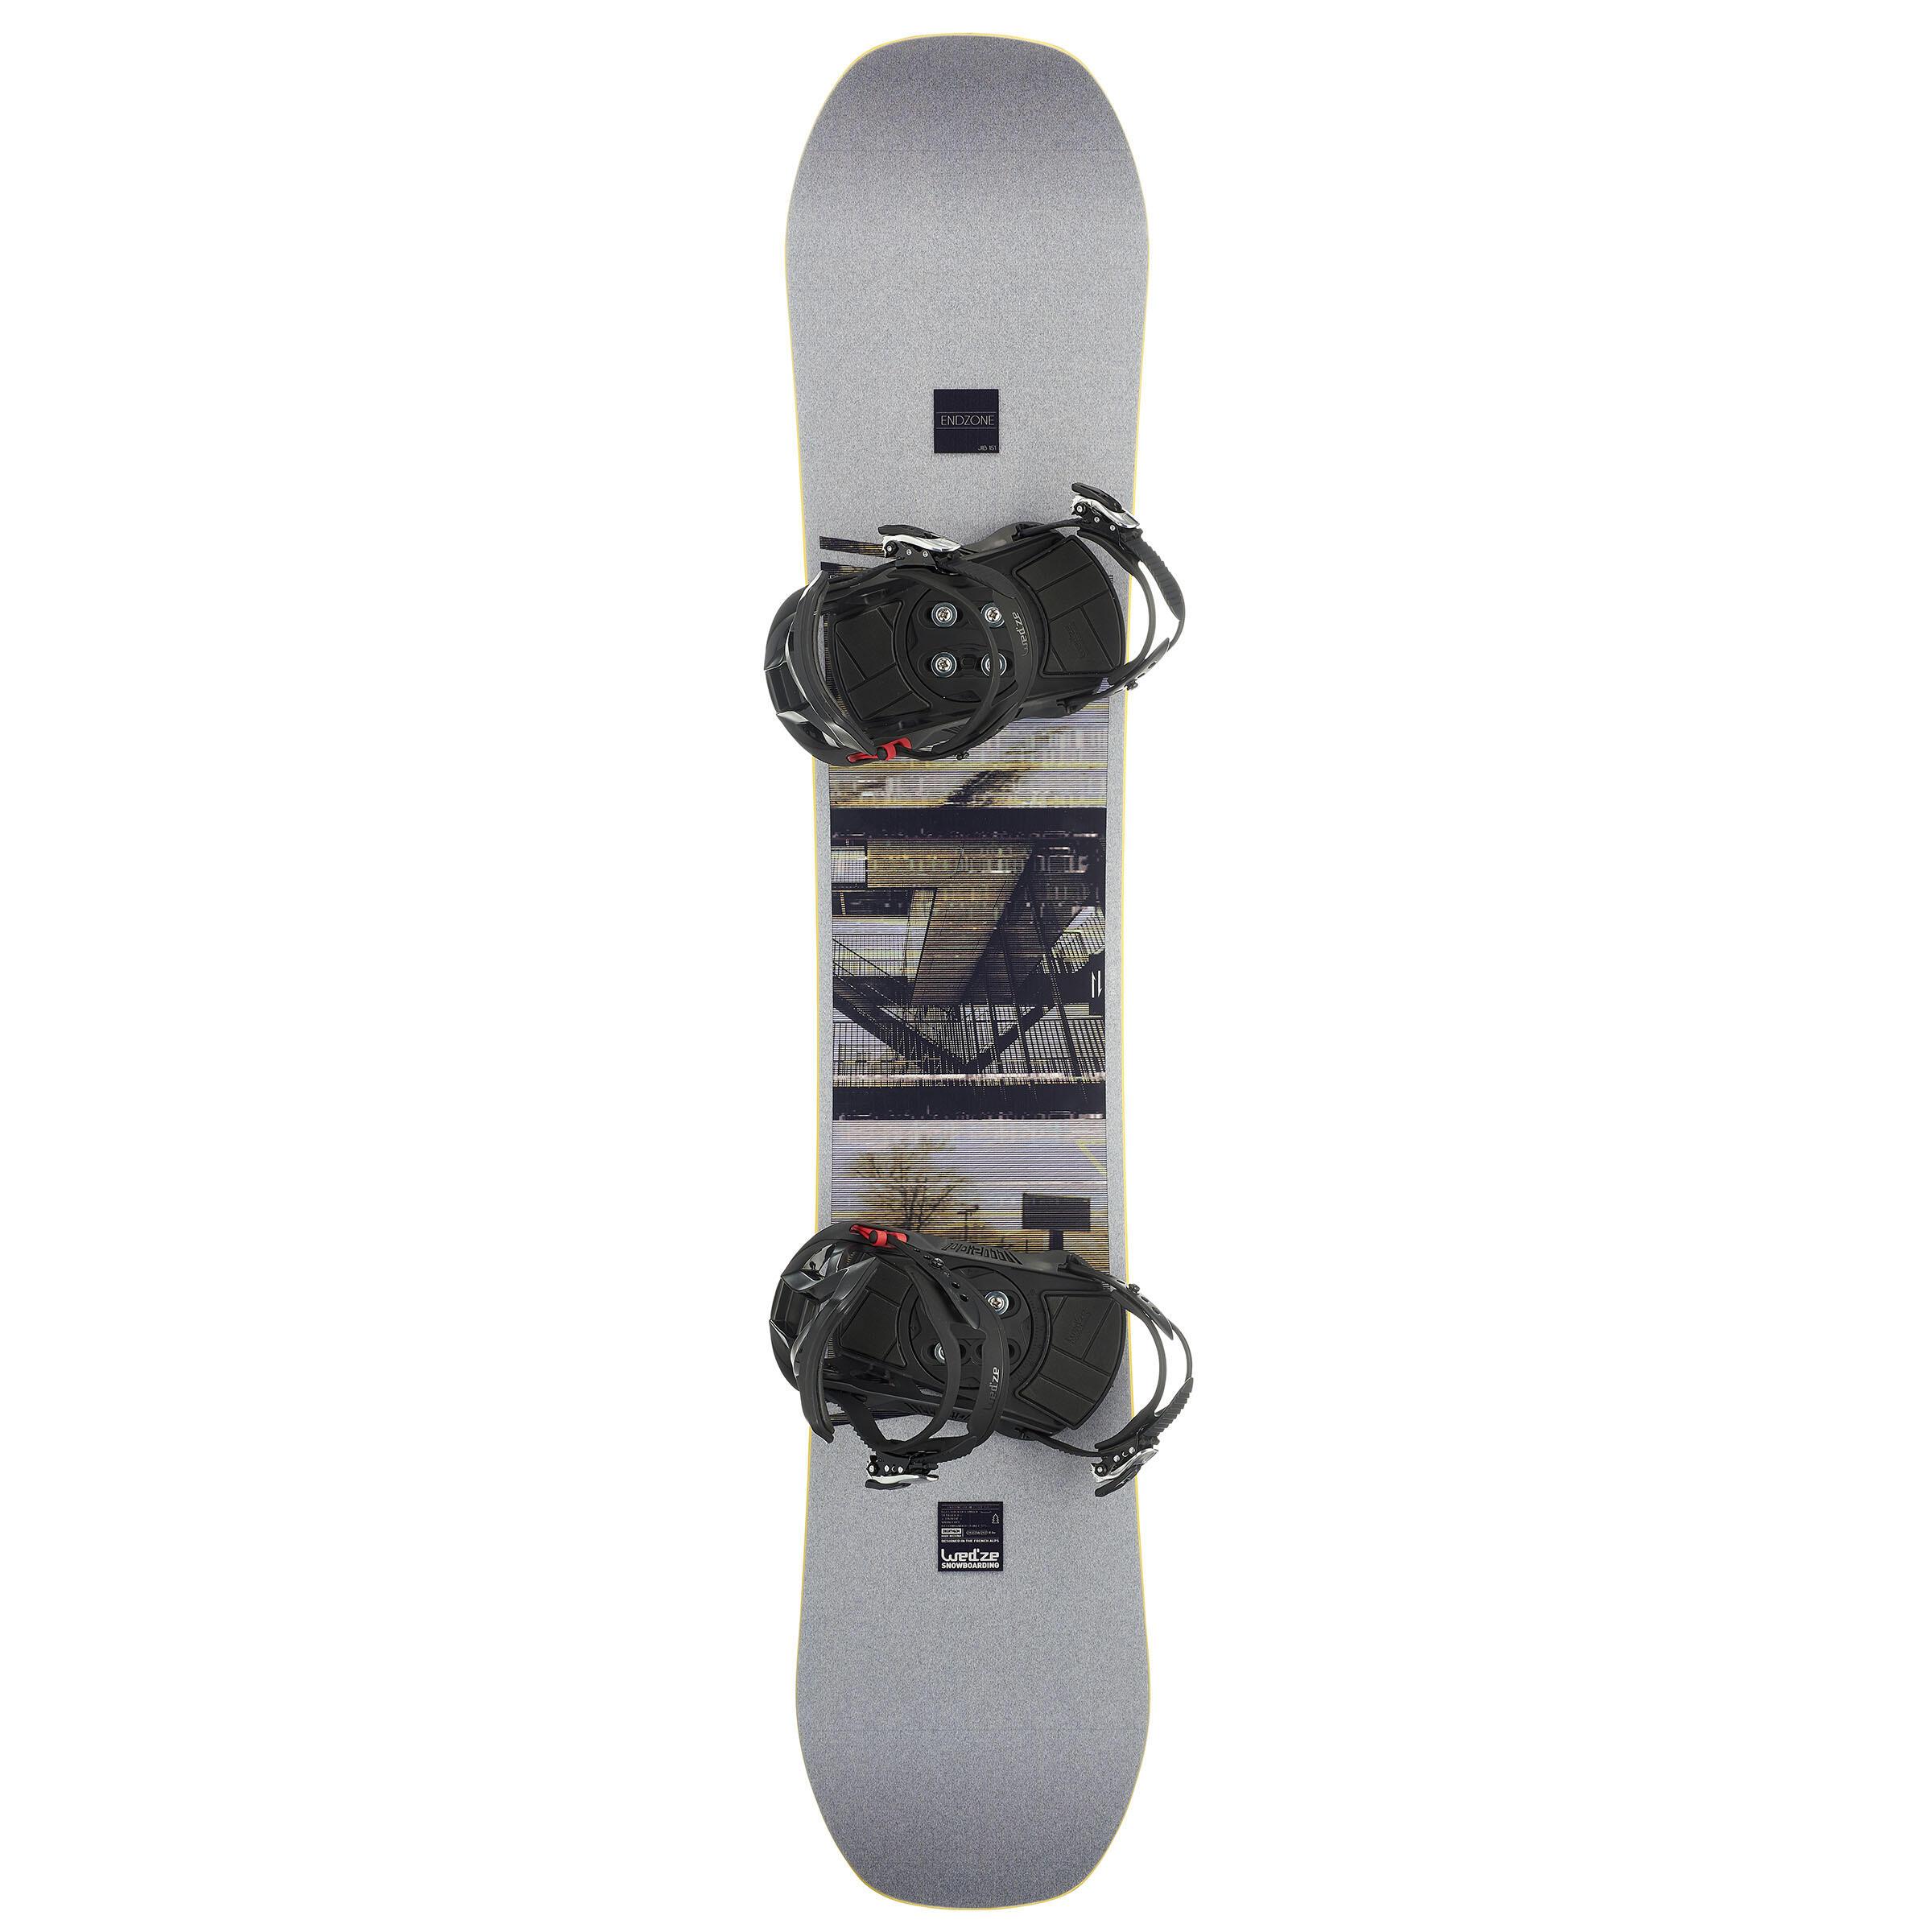 Damen,Herren Snowboard-Set End Zone 500 Jib Freestyle Piste grau | 03608449876322